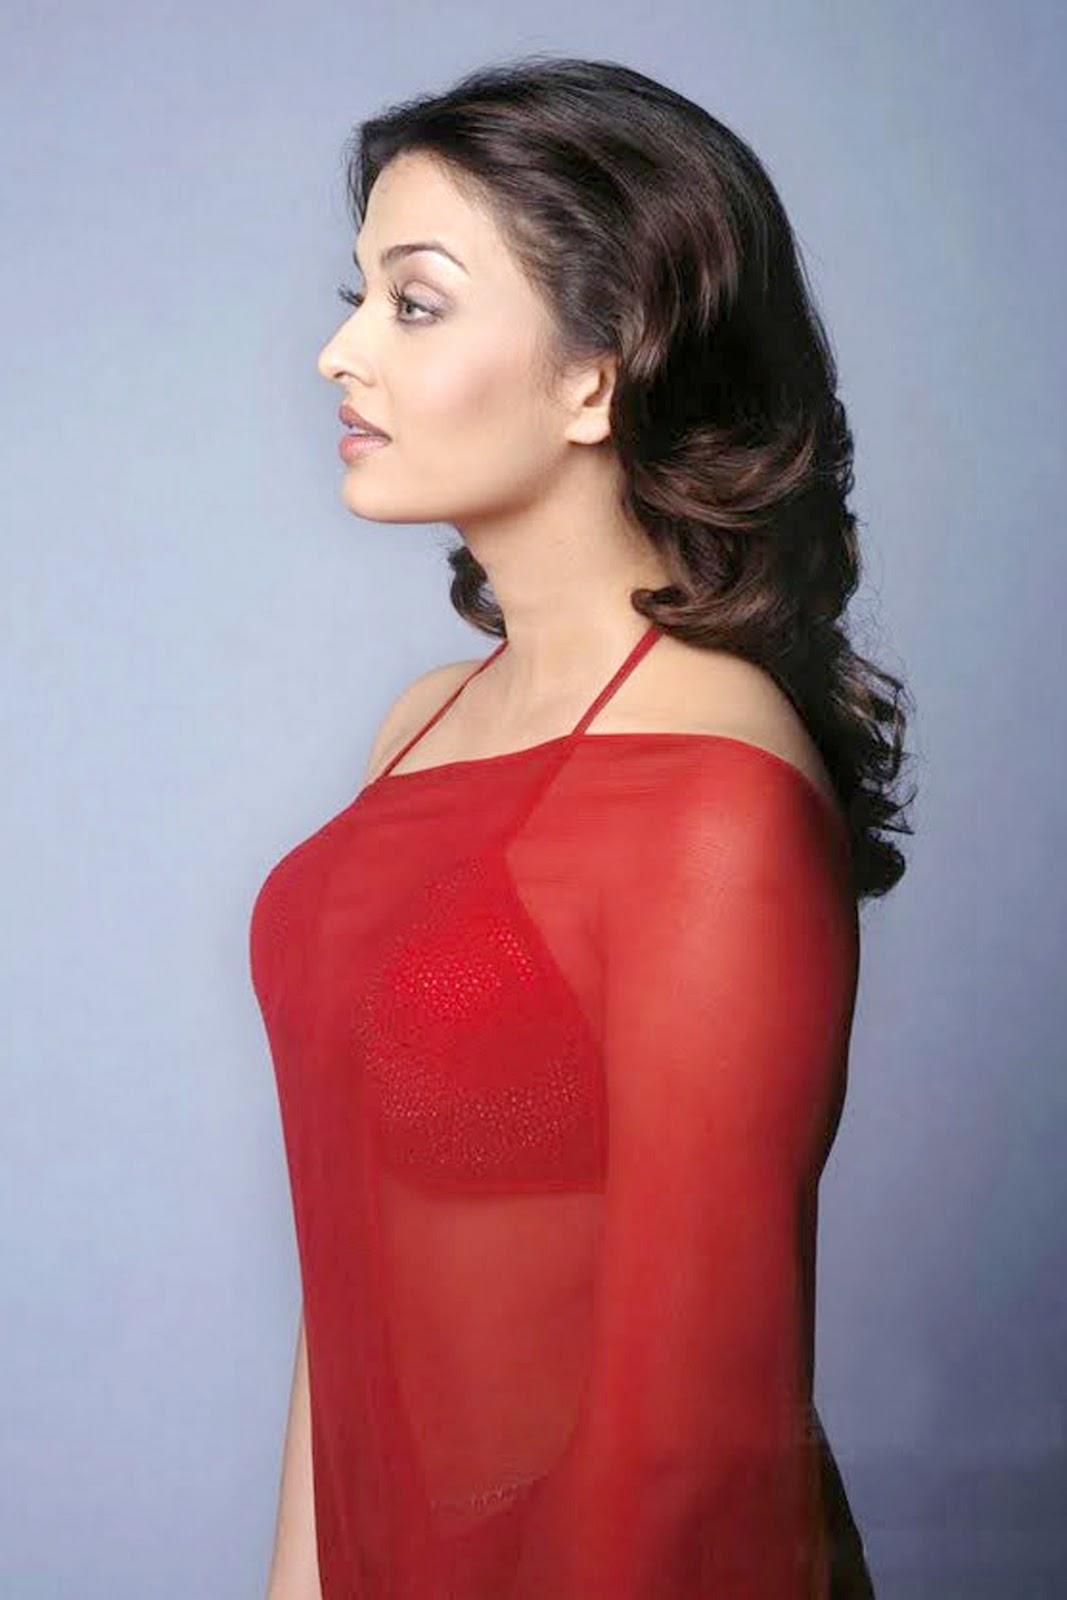 Indian Actresses Hub Aishwarya Rai Hot Pics Hub-3924